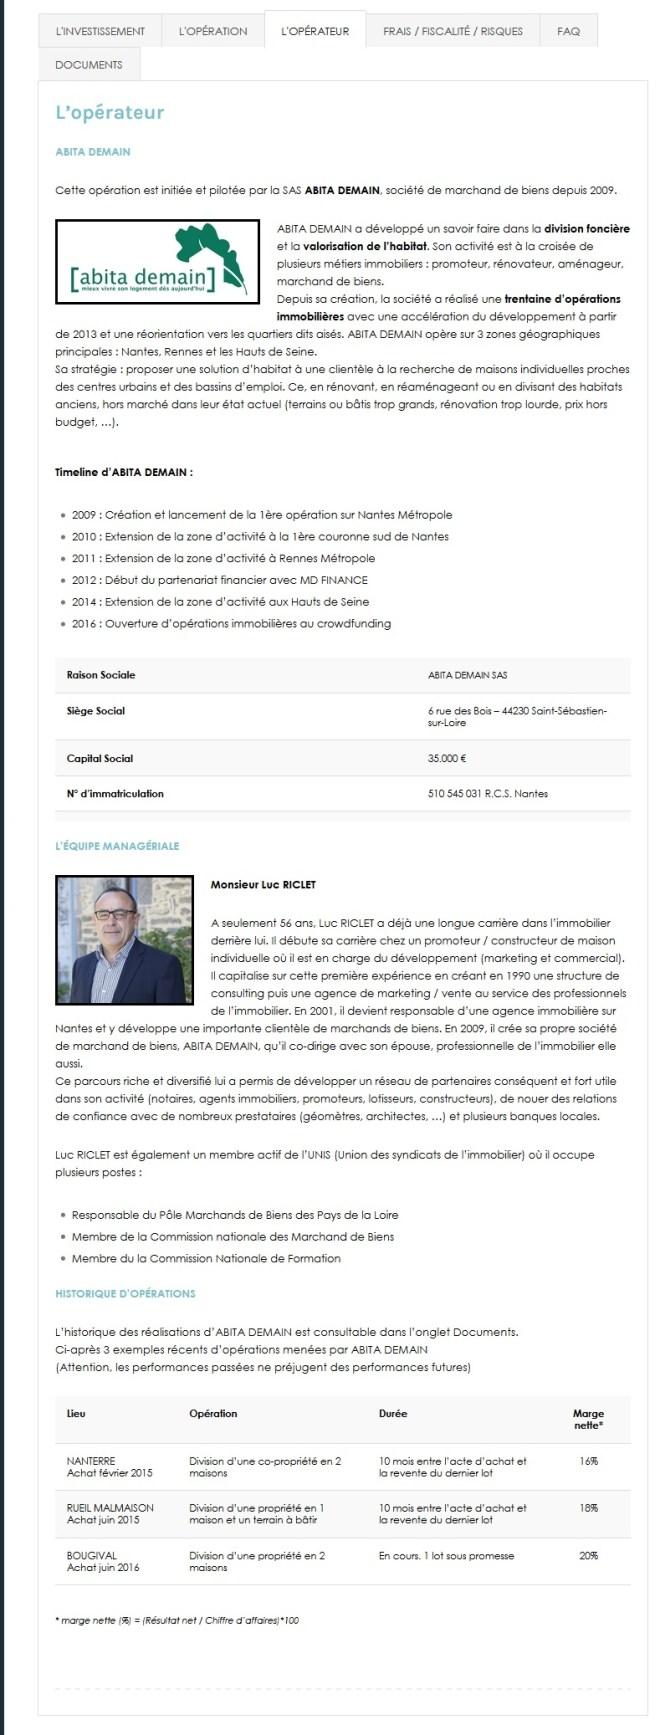 immocratie-crowdfunding-crowdlending-immobilier-projet-06